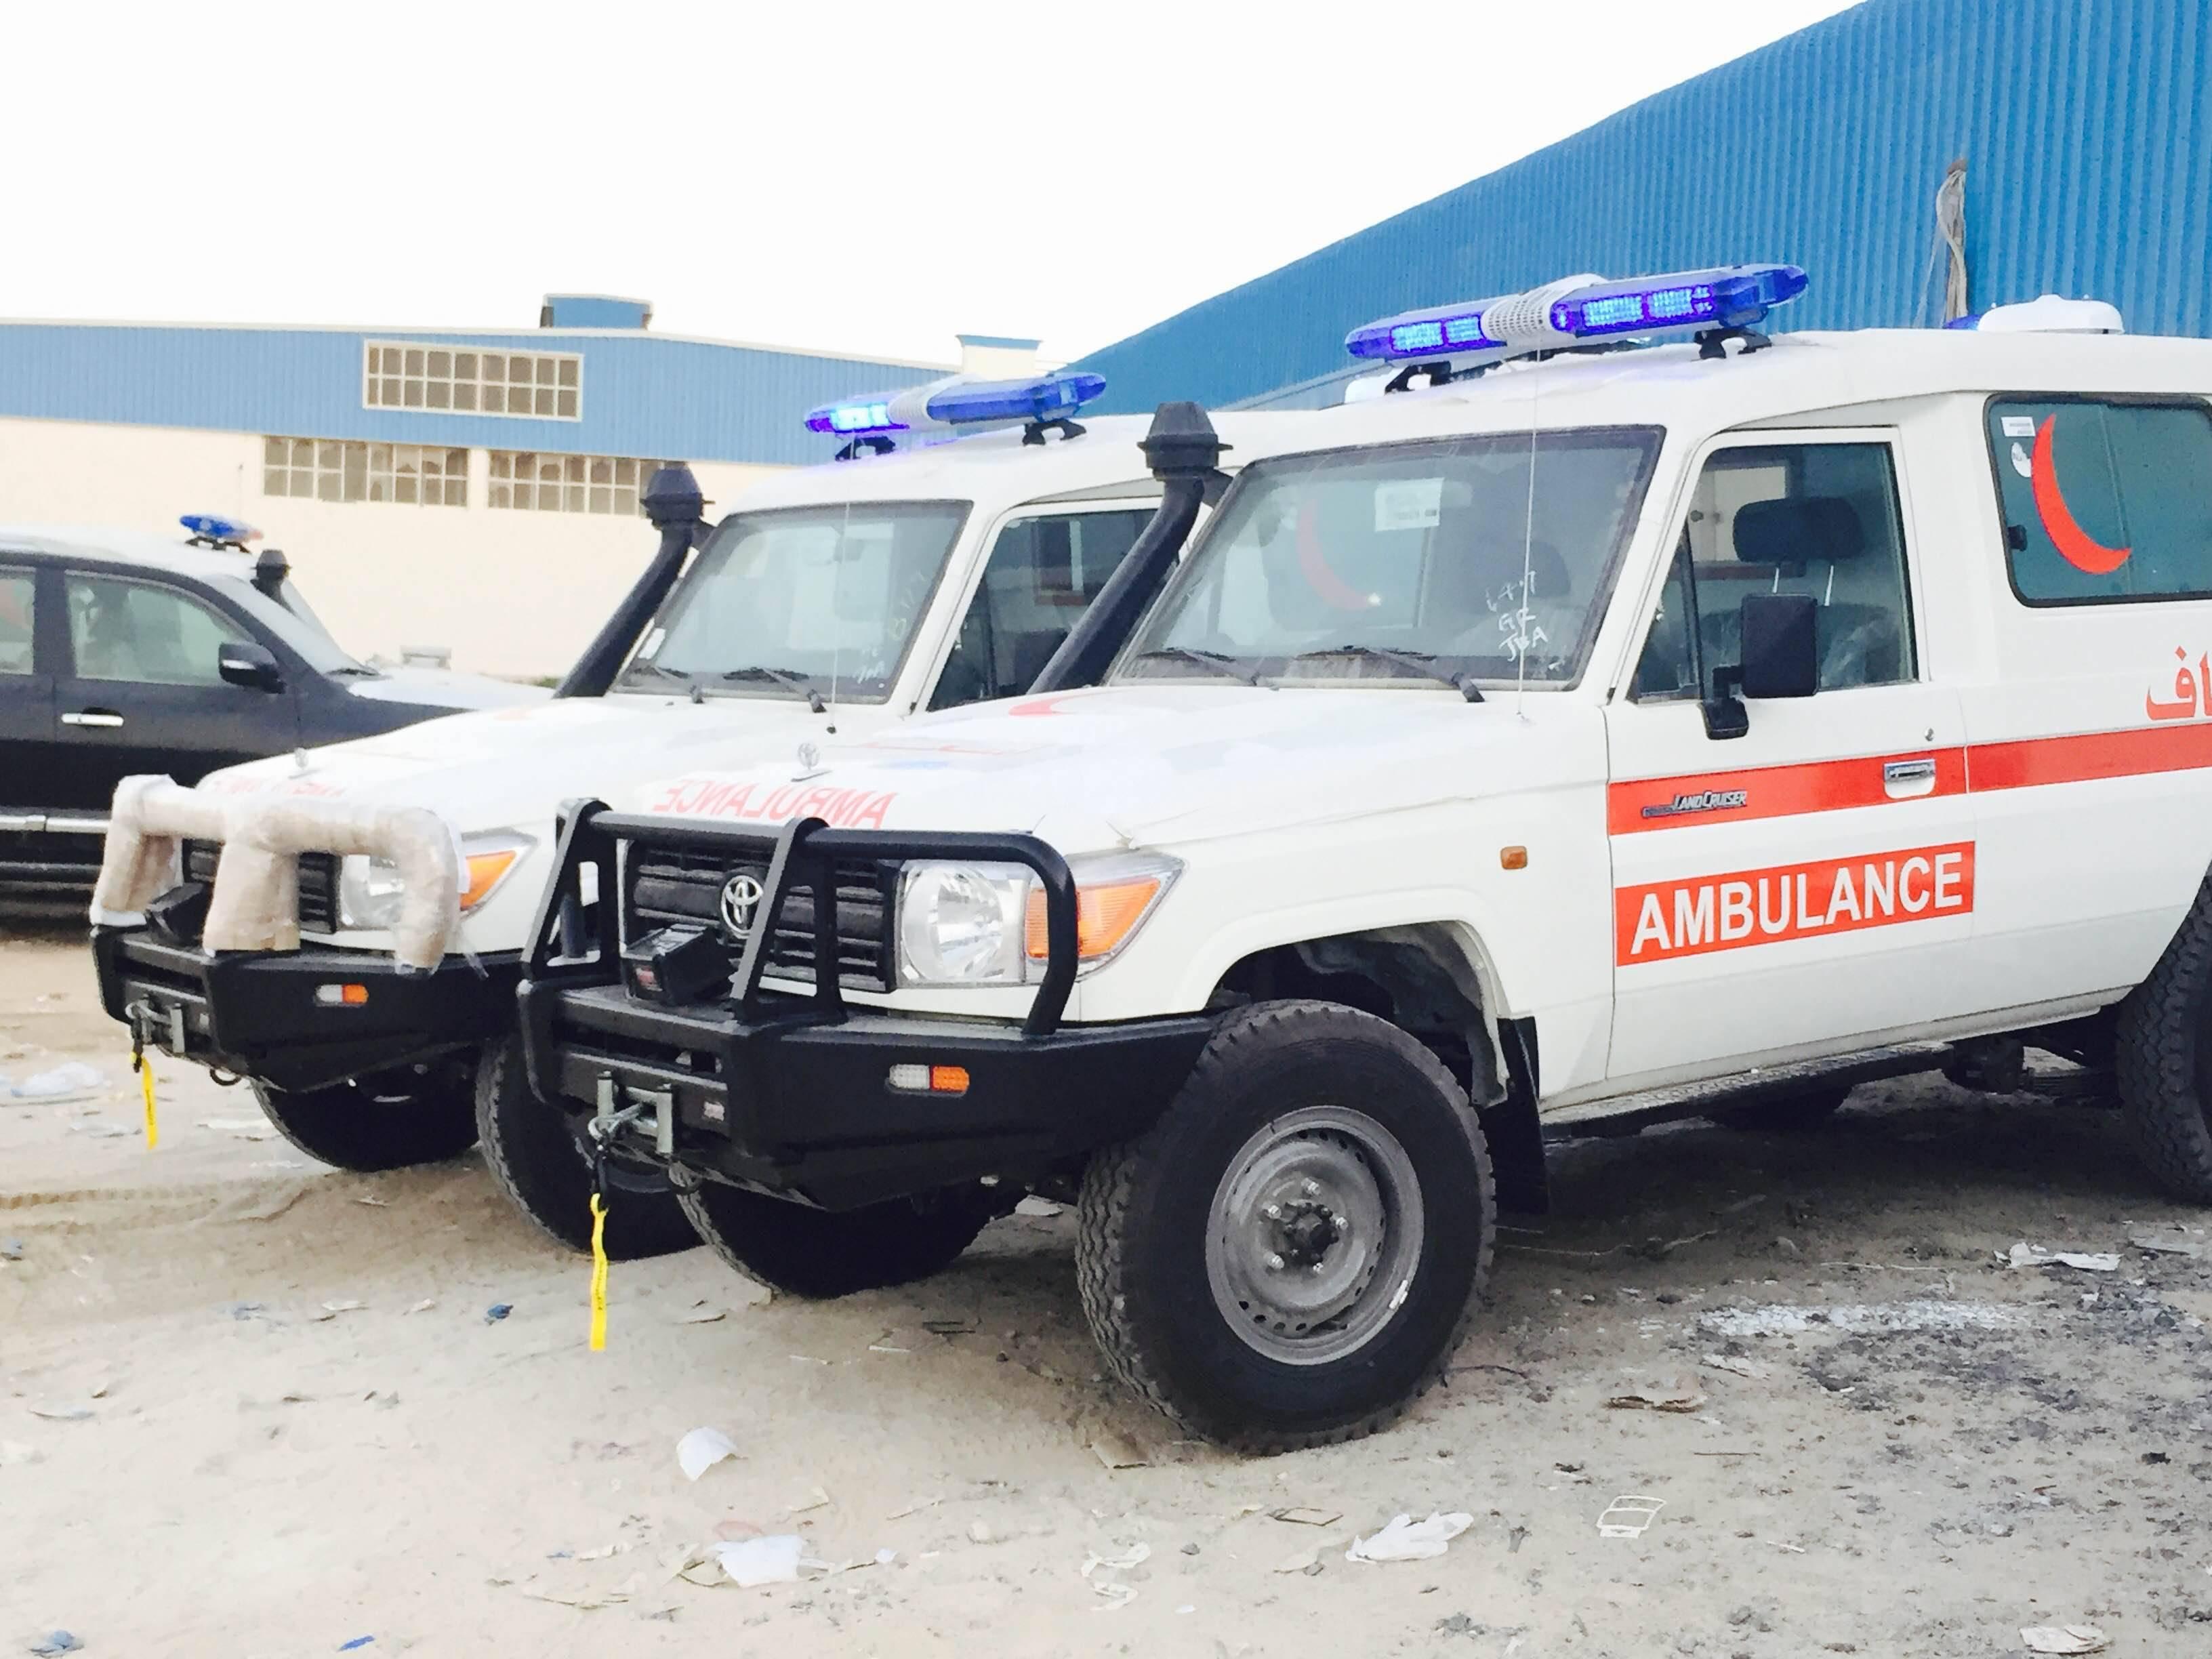 Ambulance - Toyota Land Cruiser